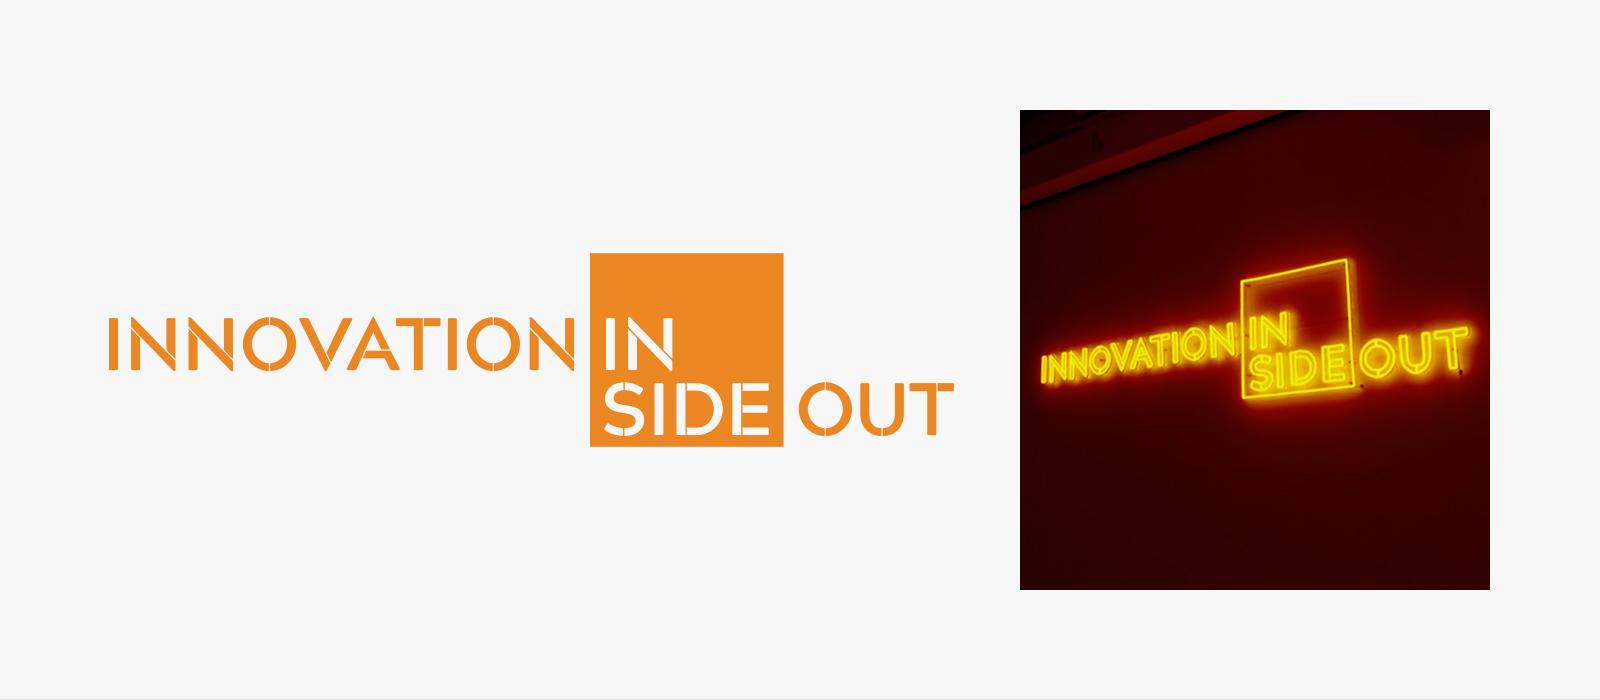 Innovation_inside_out